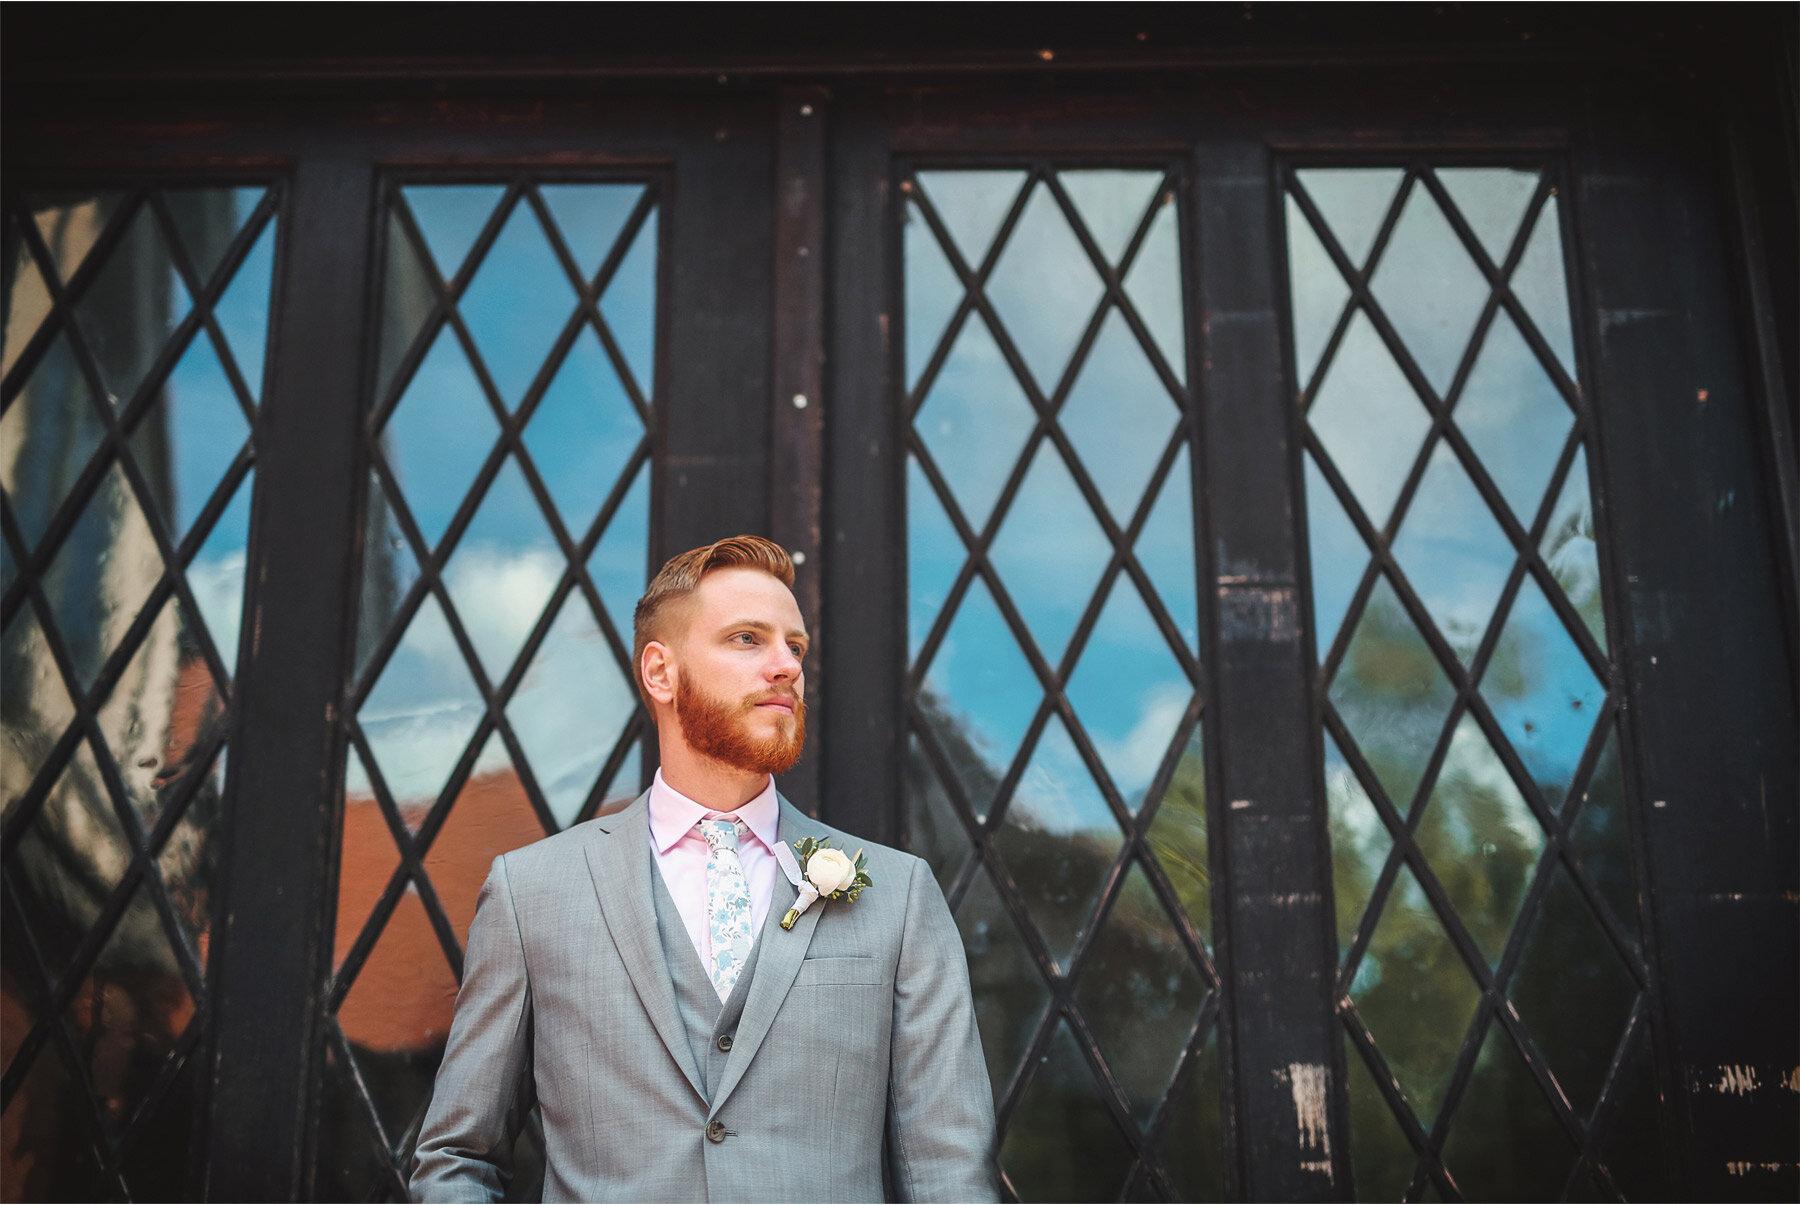 04-Vick-Photography-Wedding-Duluth-Minnesota-Glensheen-Mansion-Groom-Doors-Blue-Sky-Catherine-and-John.jpg